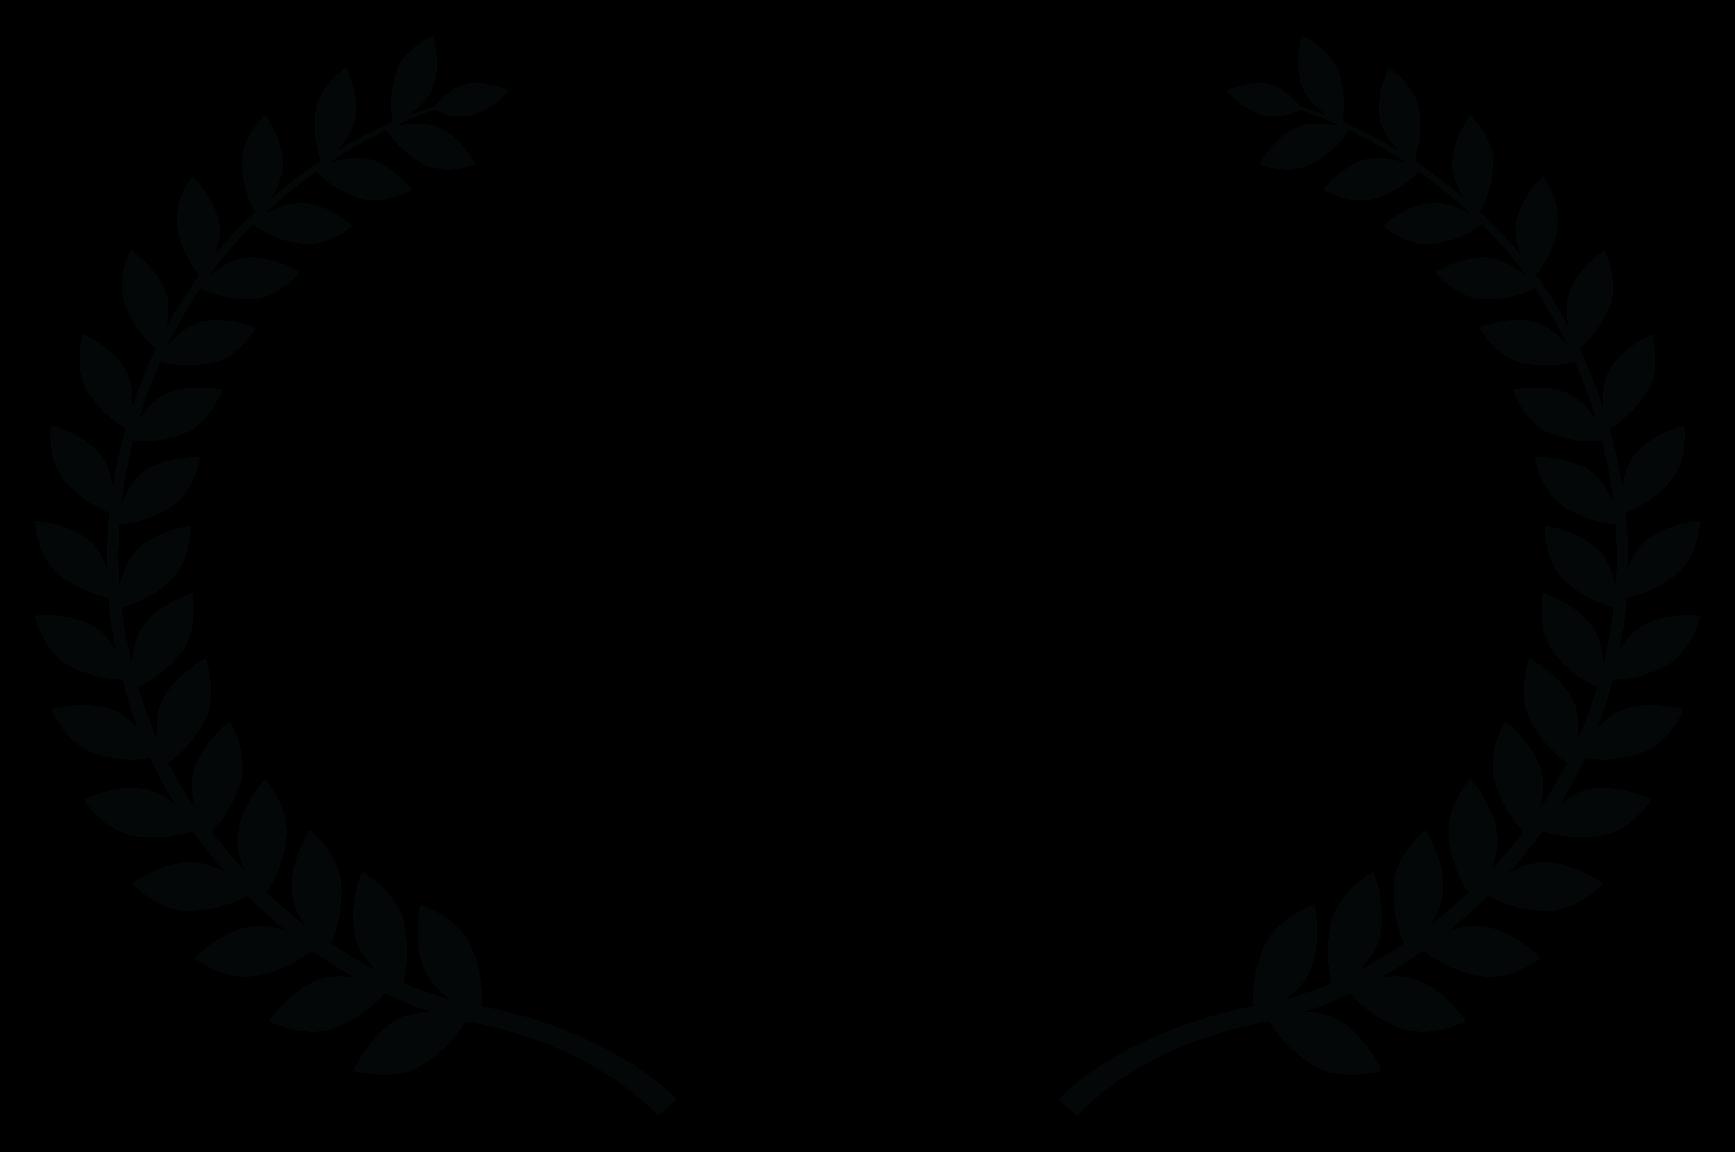 Official selection MUSIC VIDEO VIDEOART – FESTIVAL DE CINE Y VIDO CULTURA CATICA – Bolivia Sunny Day Looking for Emma Ned – Riberaigua Director – 2018